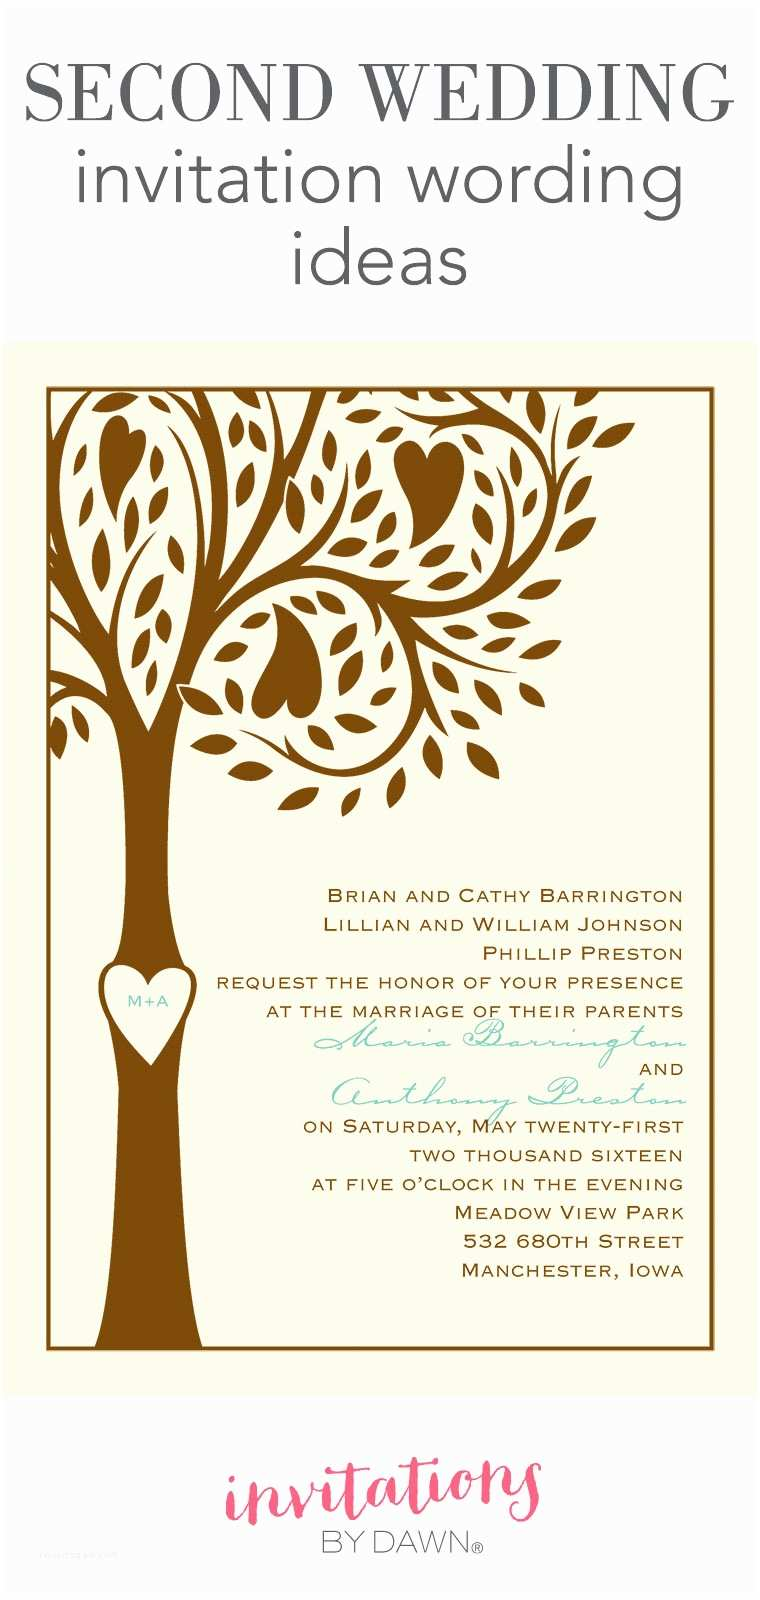 Wedding Invitation Announcement Wording Second Wedding Invitation Wording